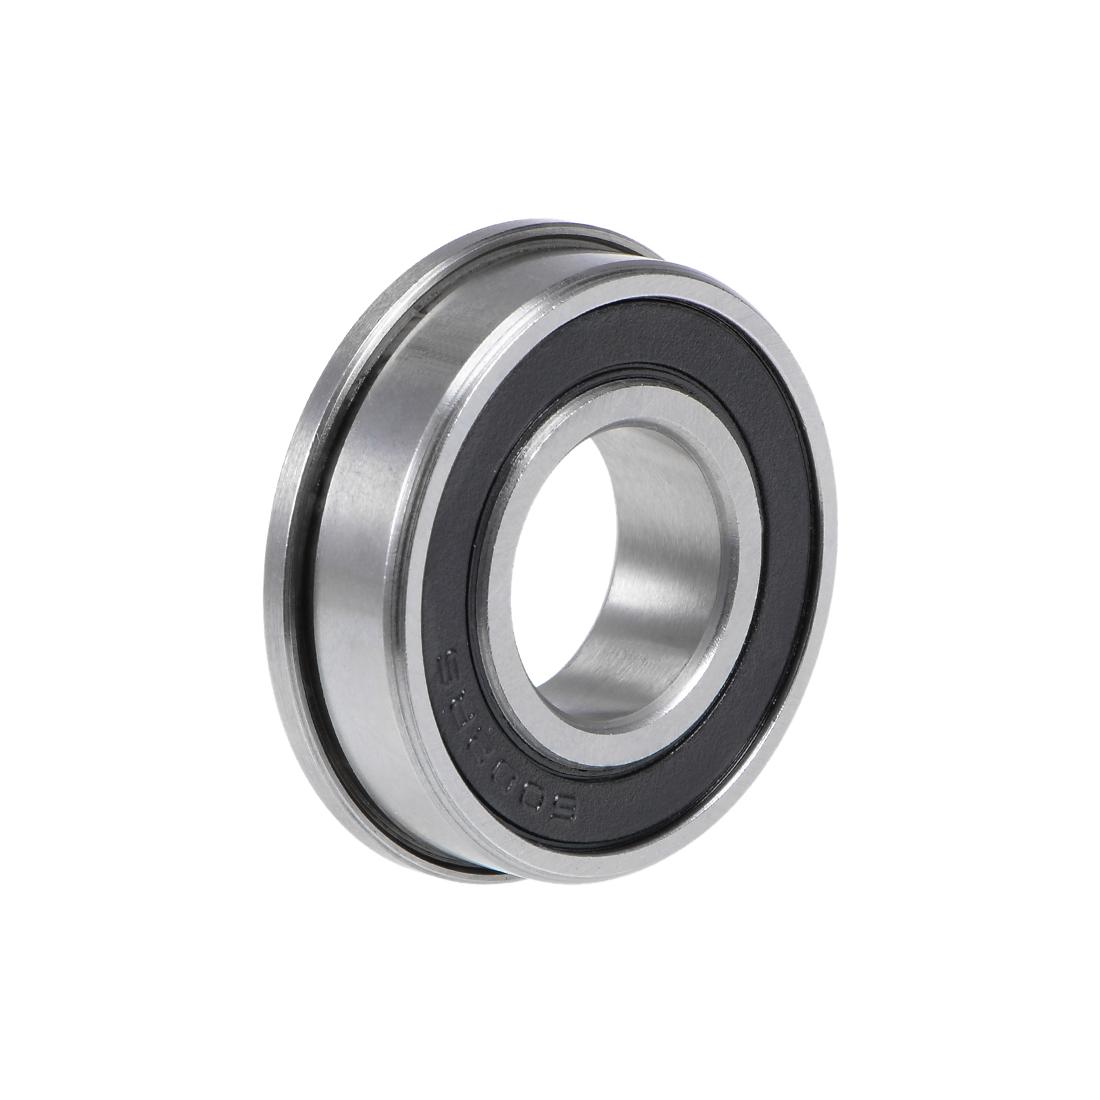 F6002-2RS Flange Ball Bearing 15x32x9mm Sealed Chrome Bearings